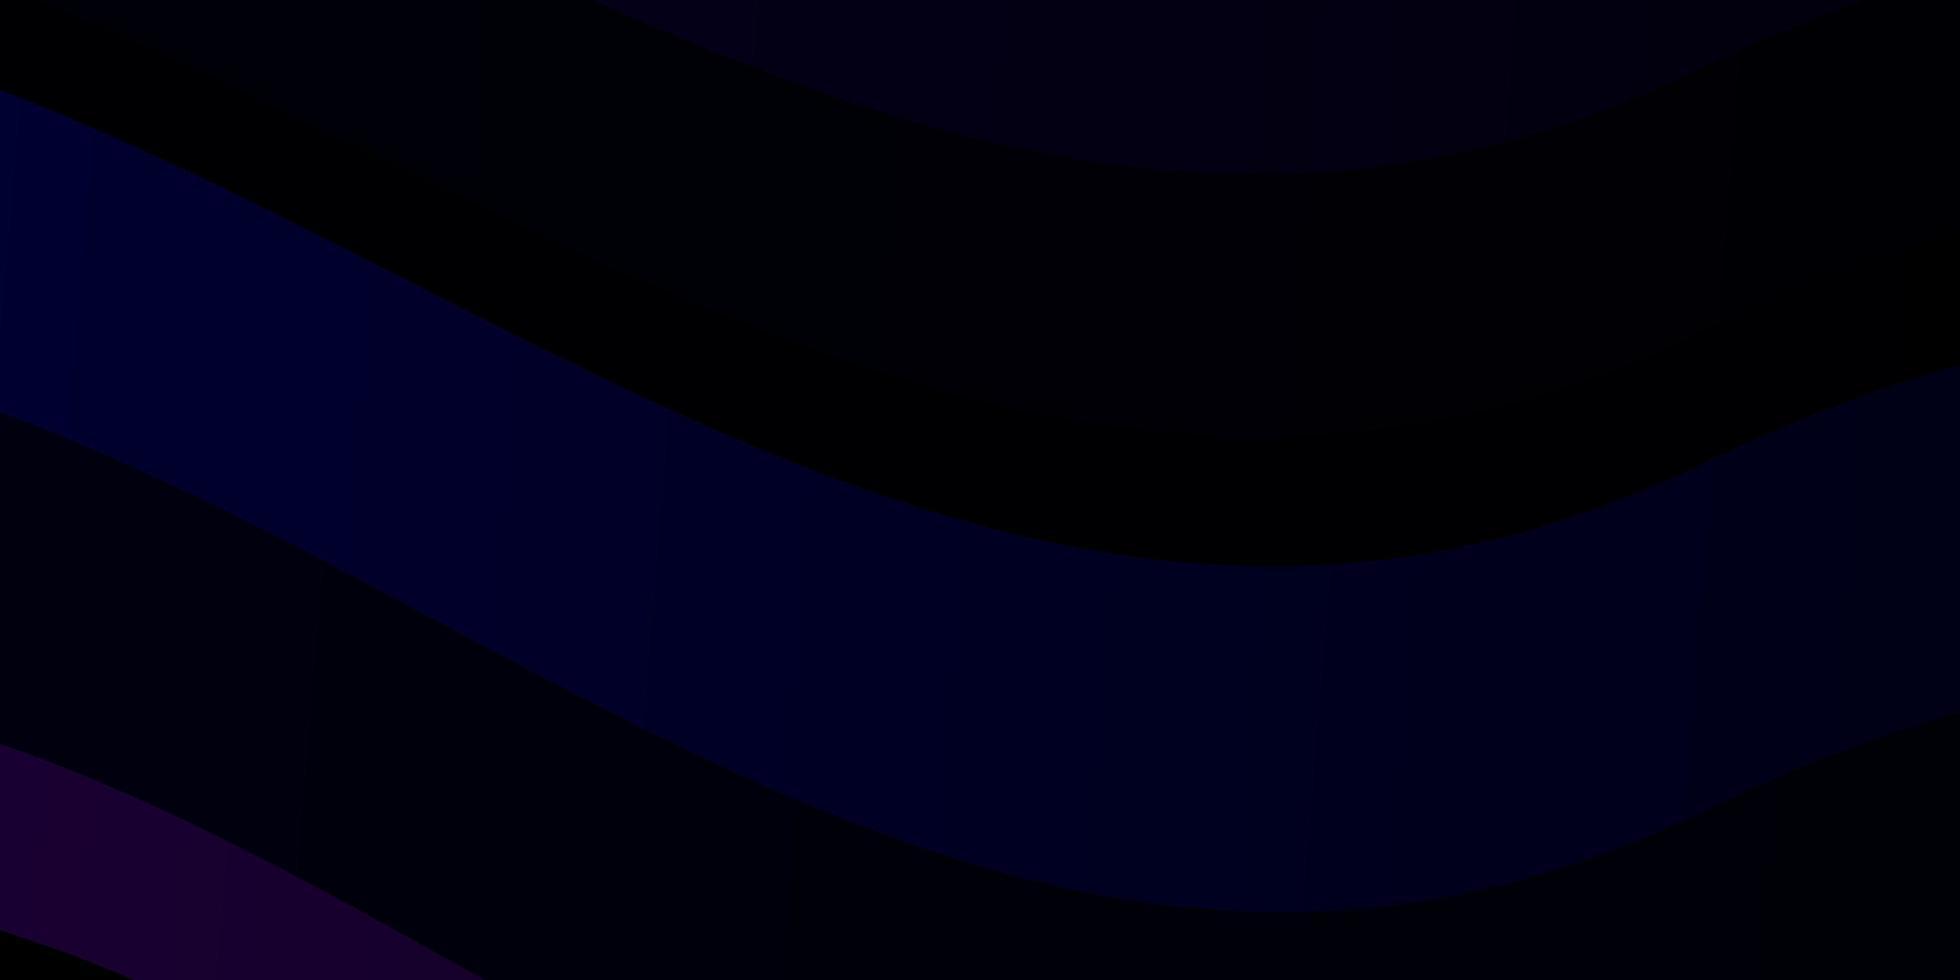 patrón de vector de color rosa oscuro, azul con líneas.